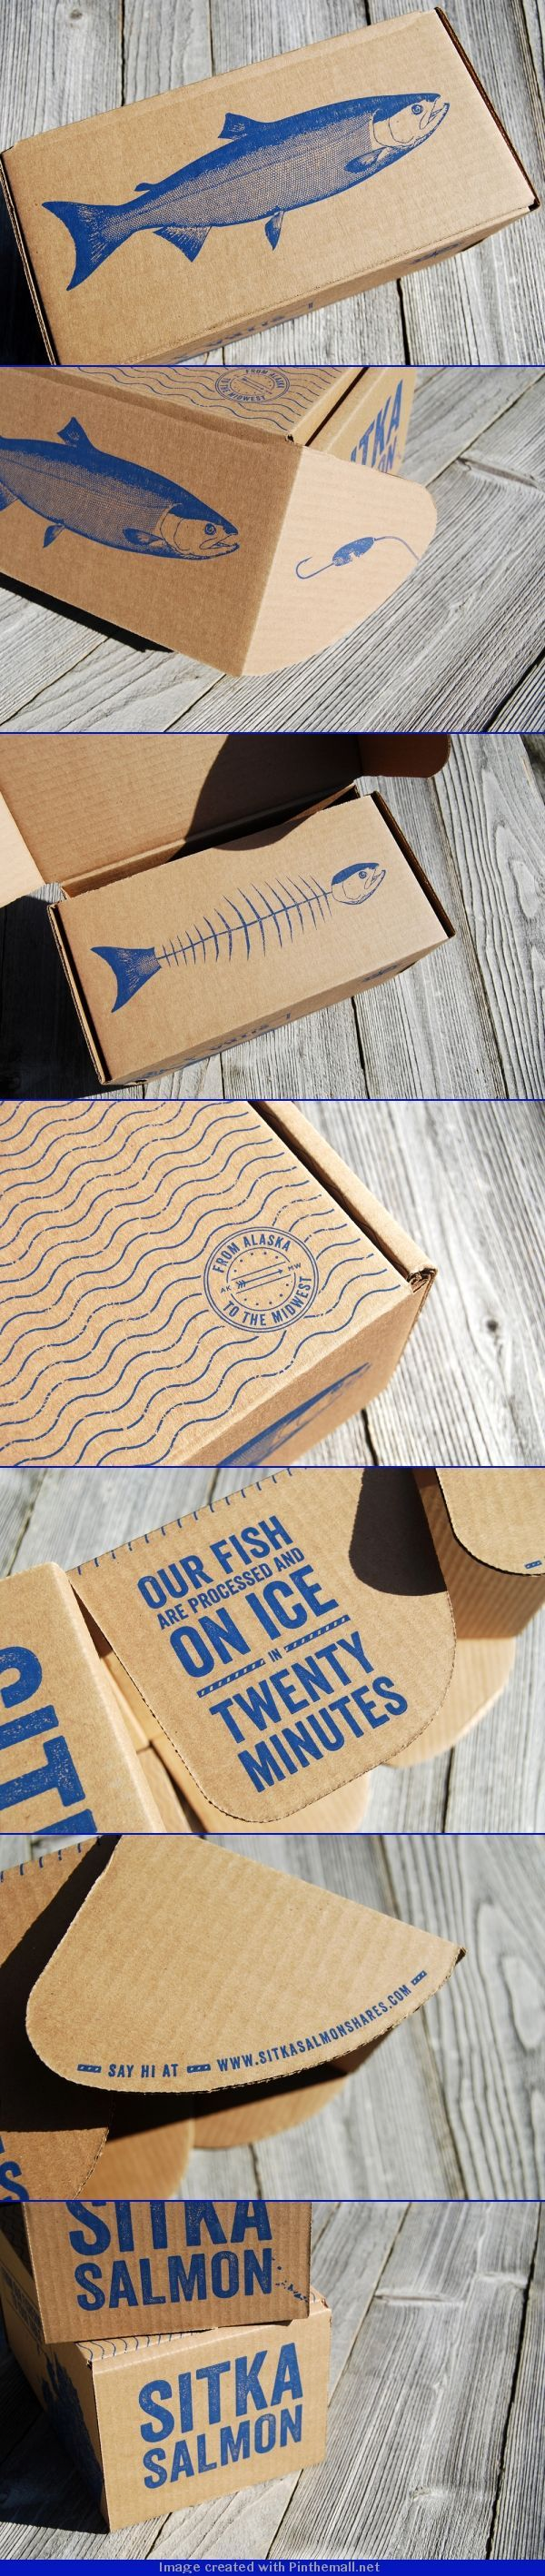 Sitka Salmon Packaging.